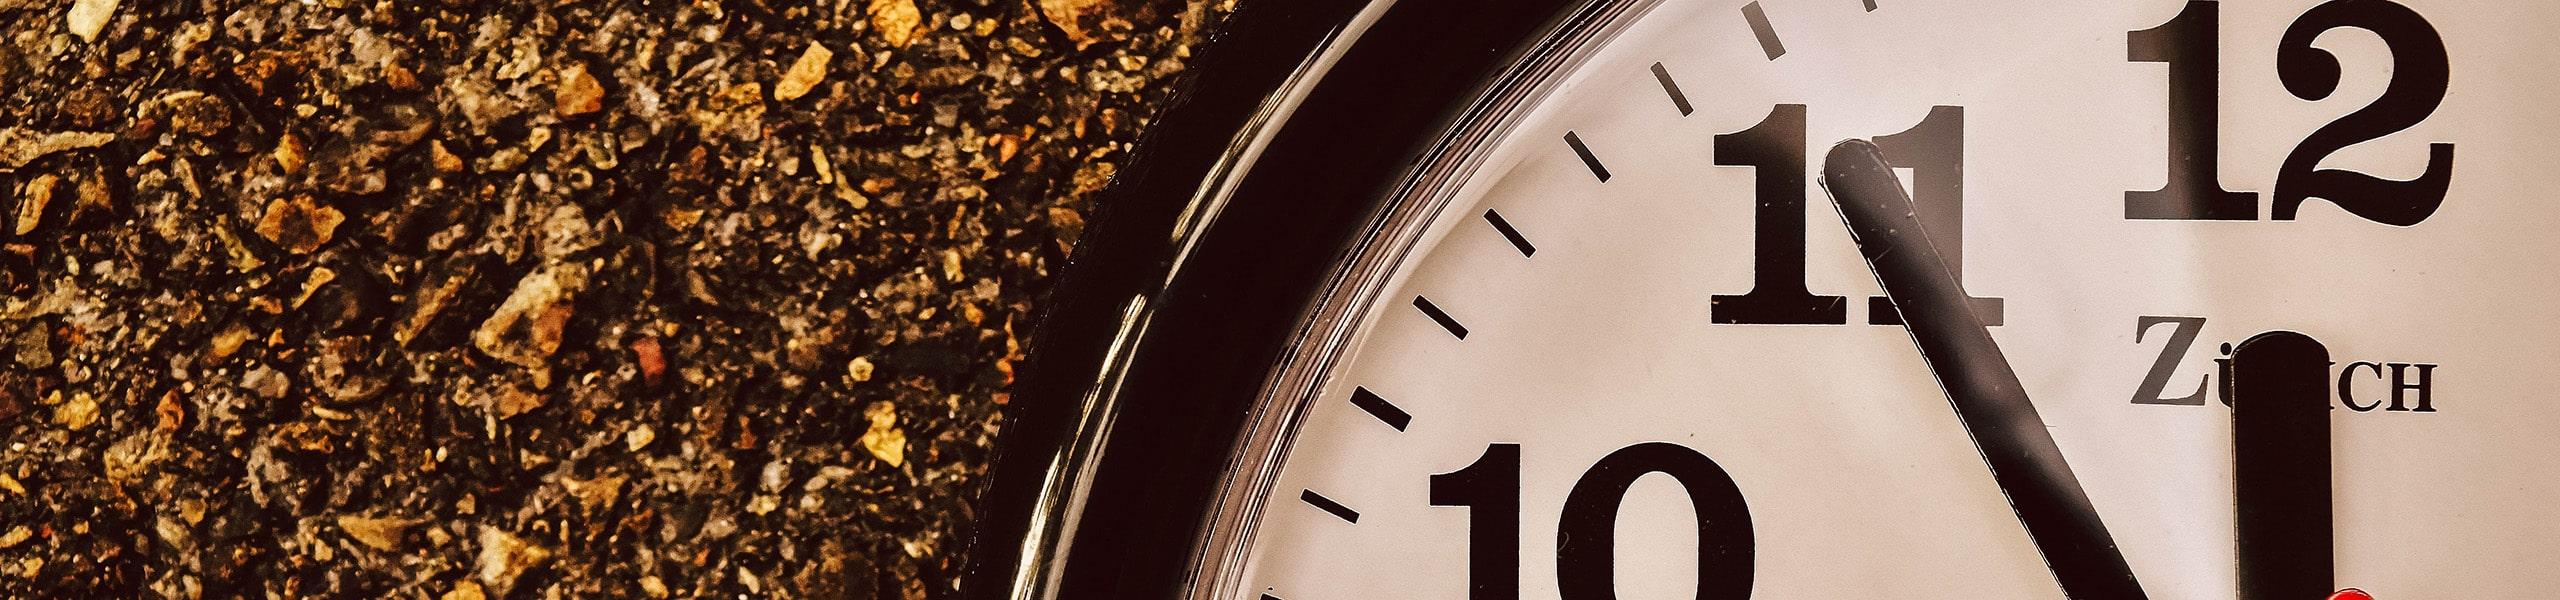 Symbolbild Uhrzeit